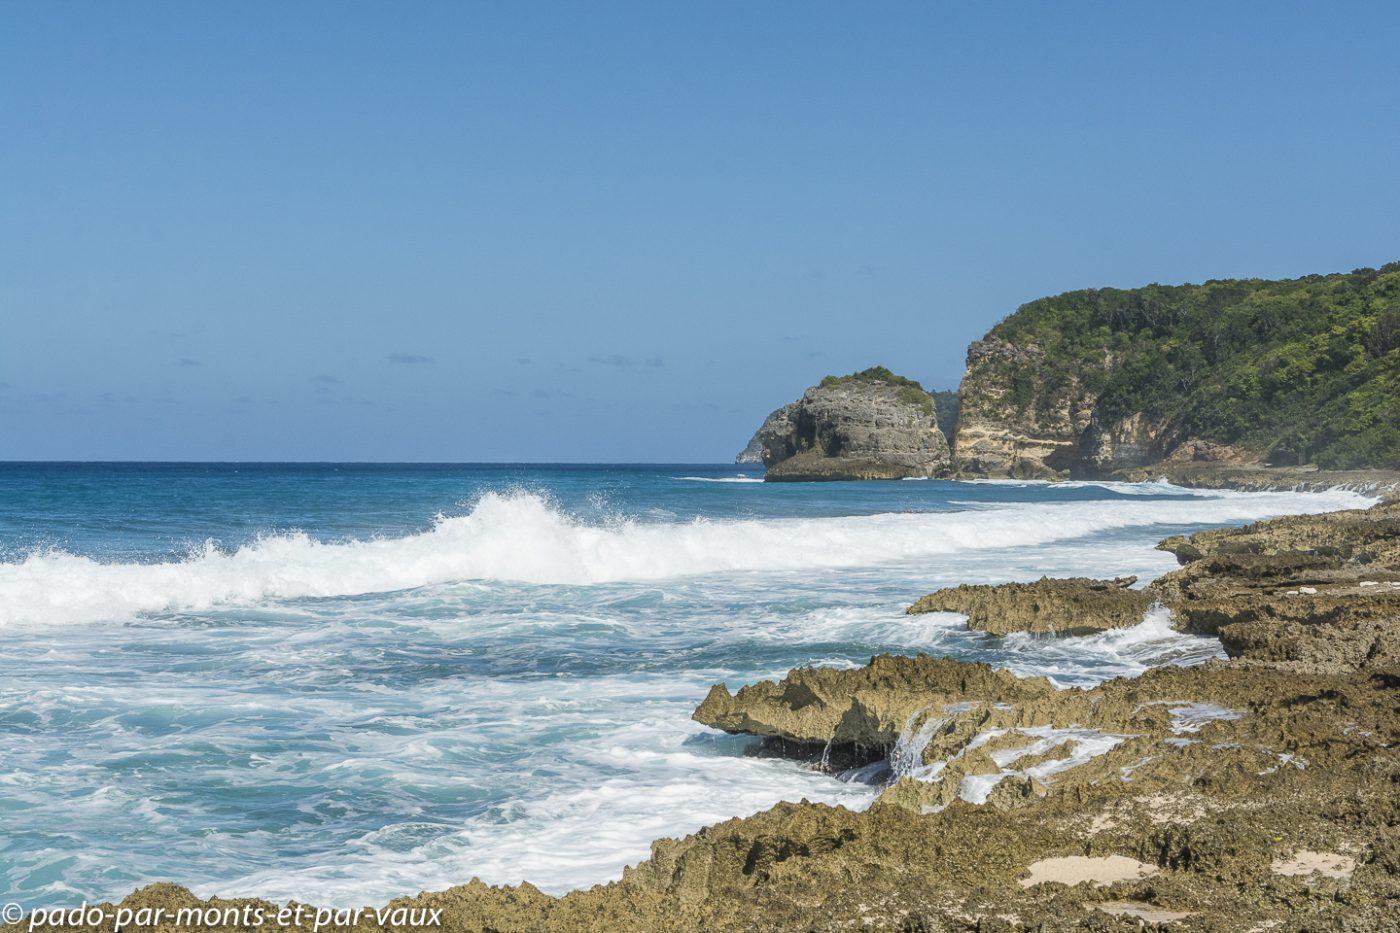 2021- Guadeloupe- Trace des pêcheurs